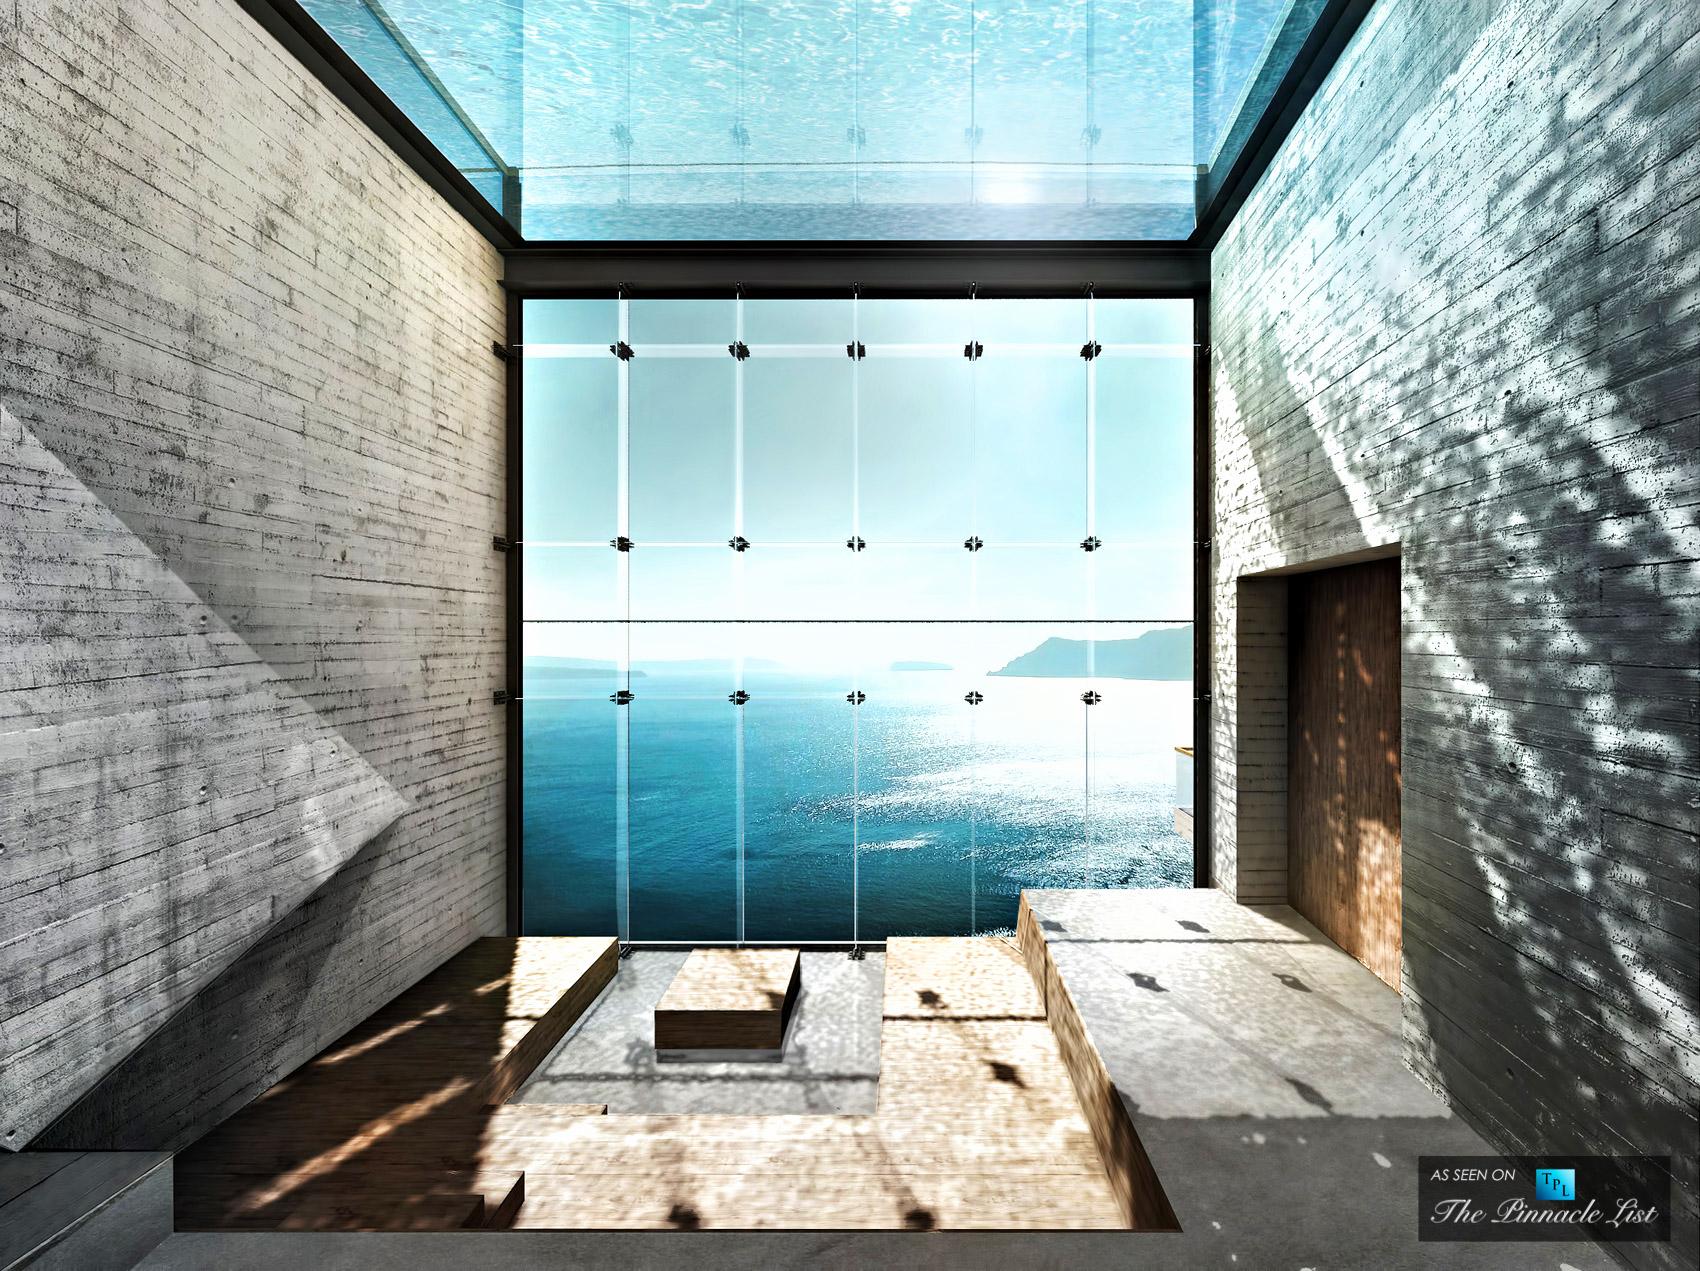 Imagine Living Inside a Cliff – Luxury Home Wedged Cliffside, Sunken Clifftop